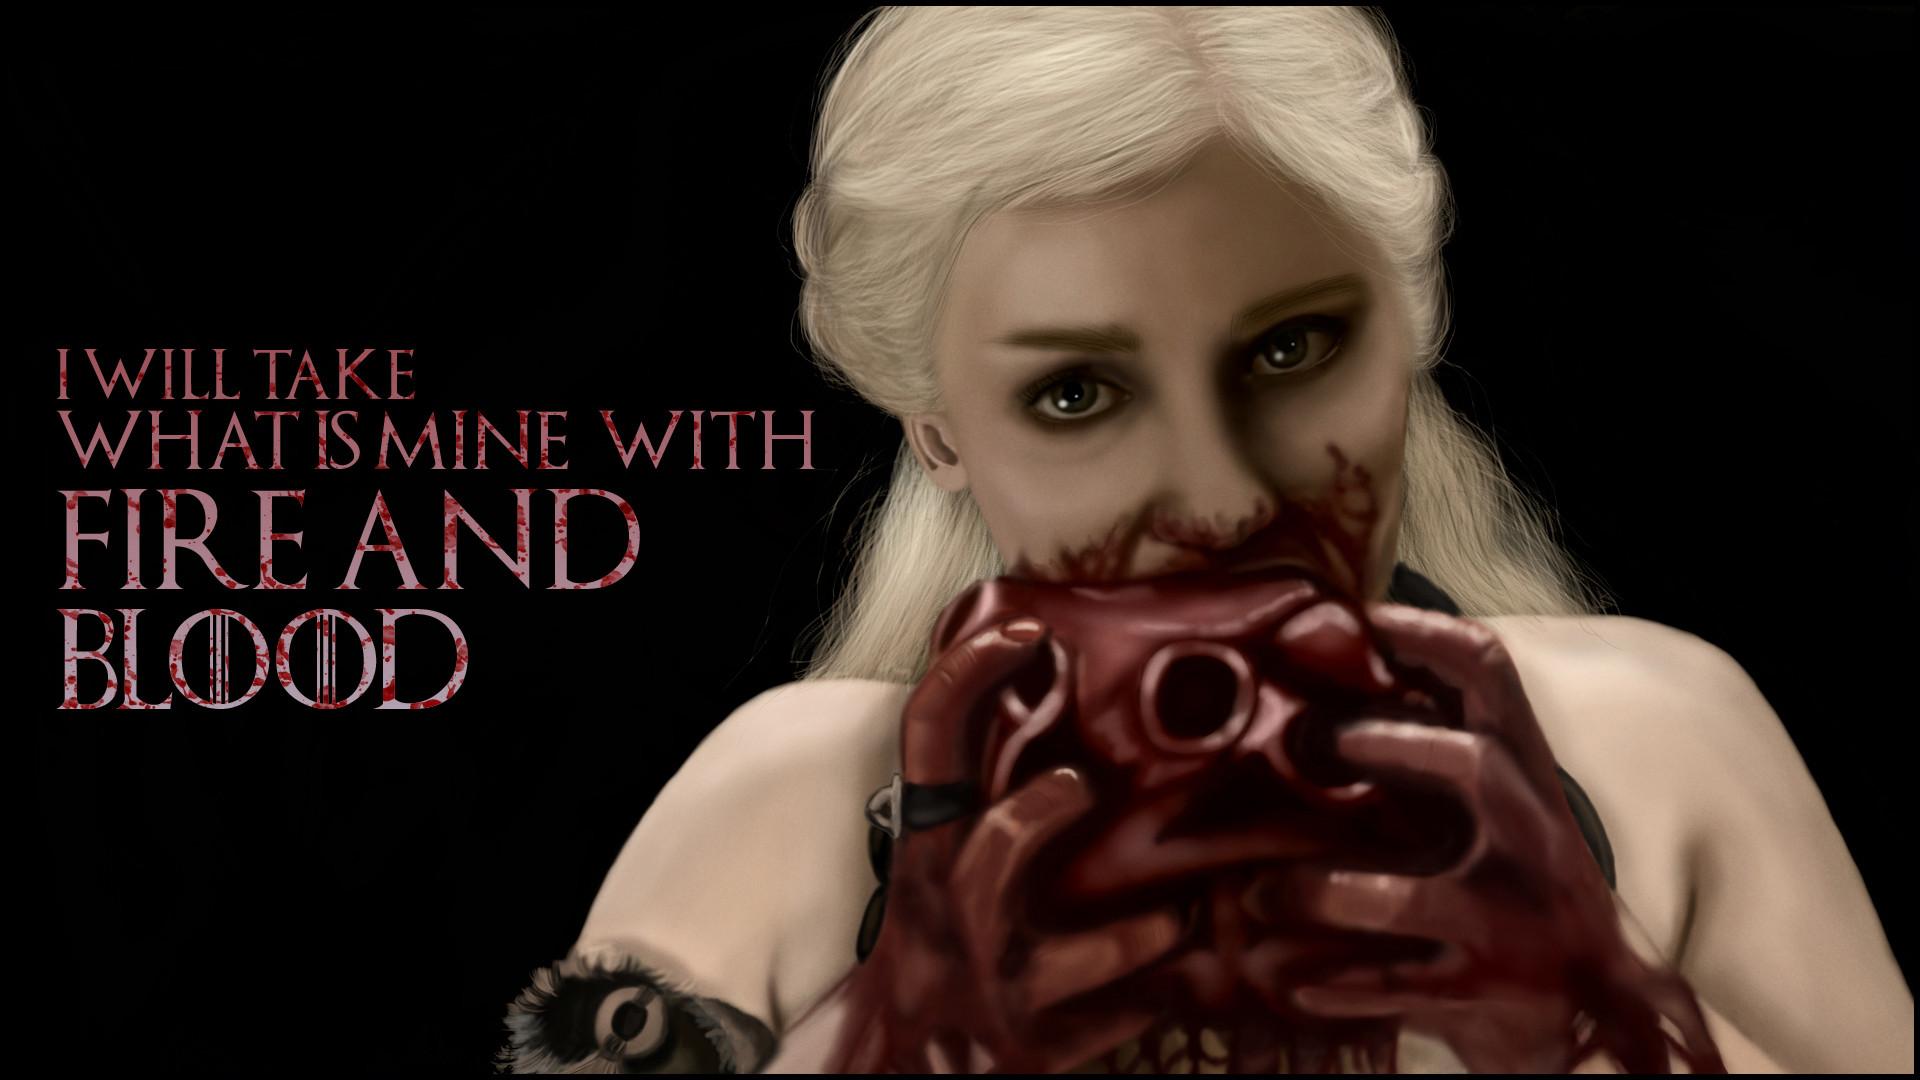 Game of Thrones Daenerys Drawing Game of Thrones Daenerys